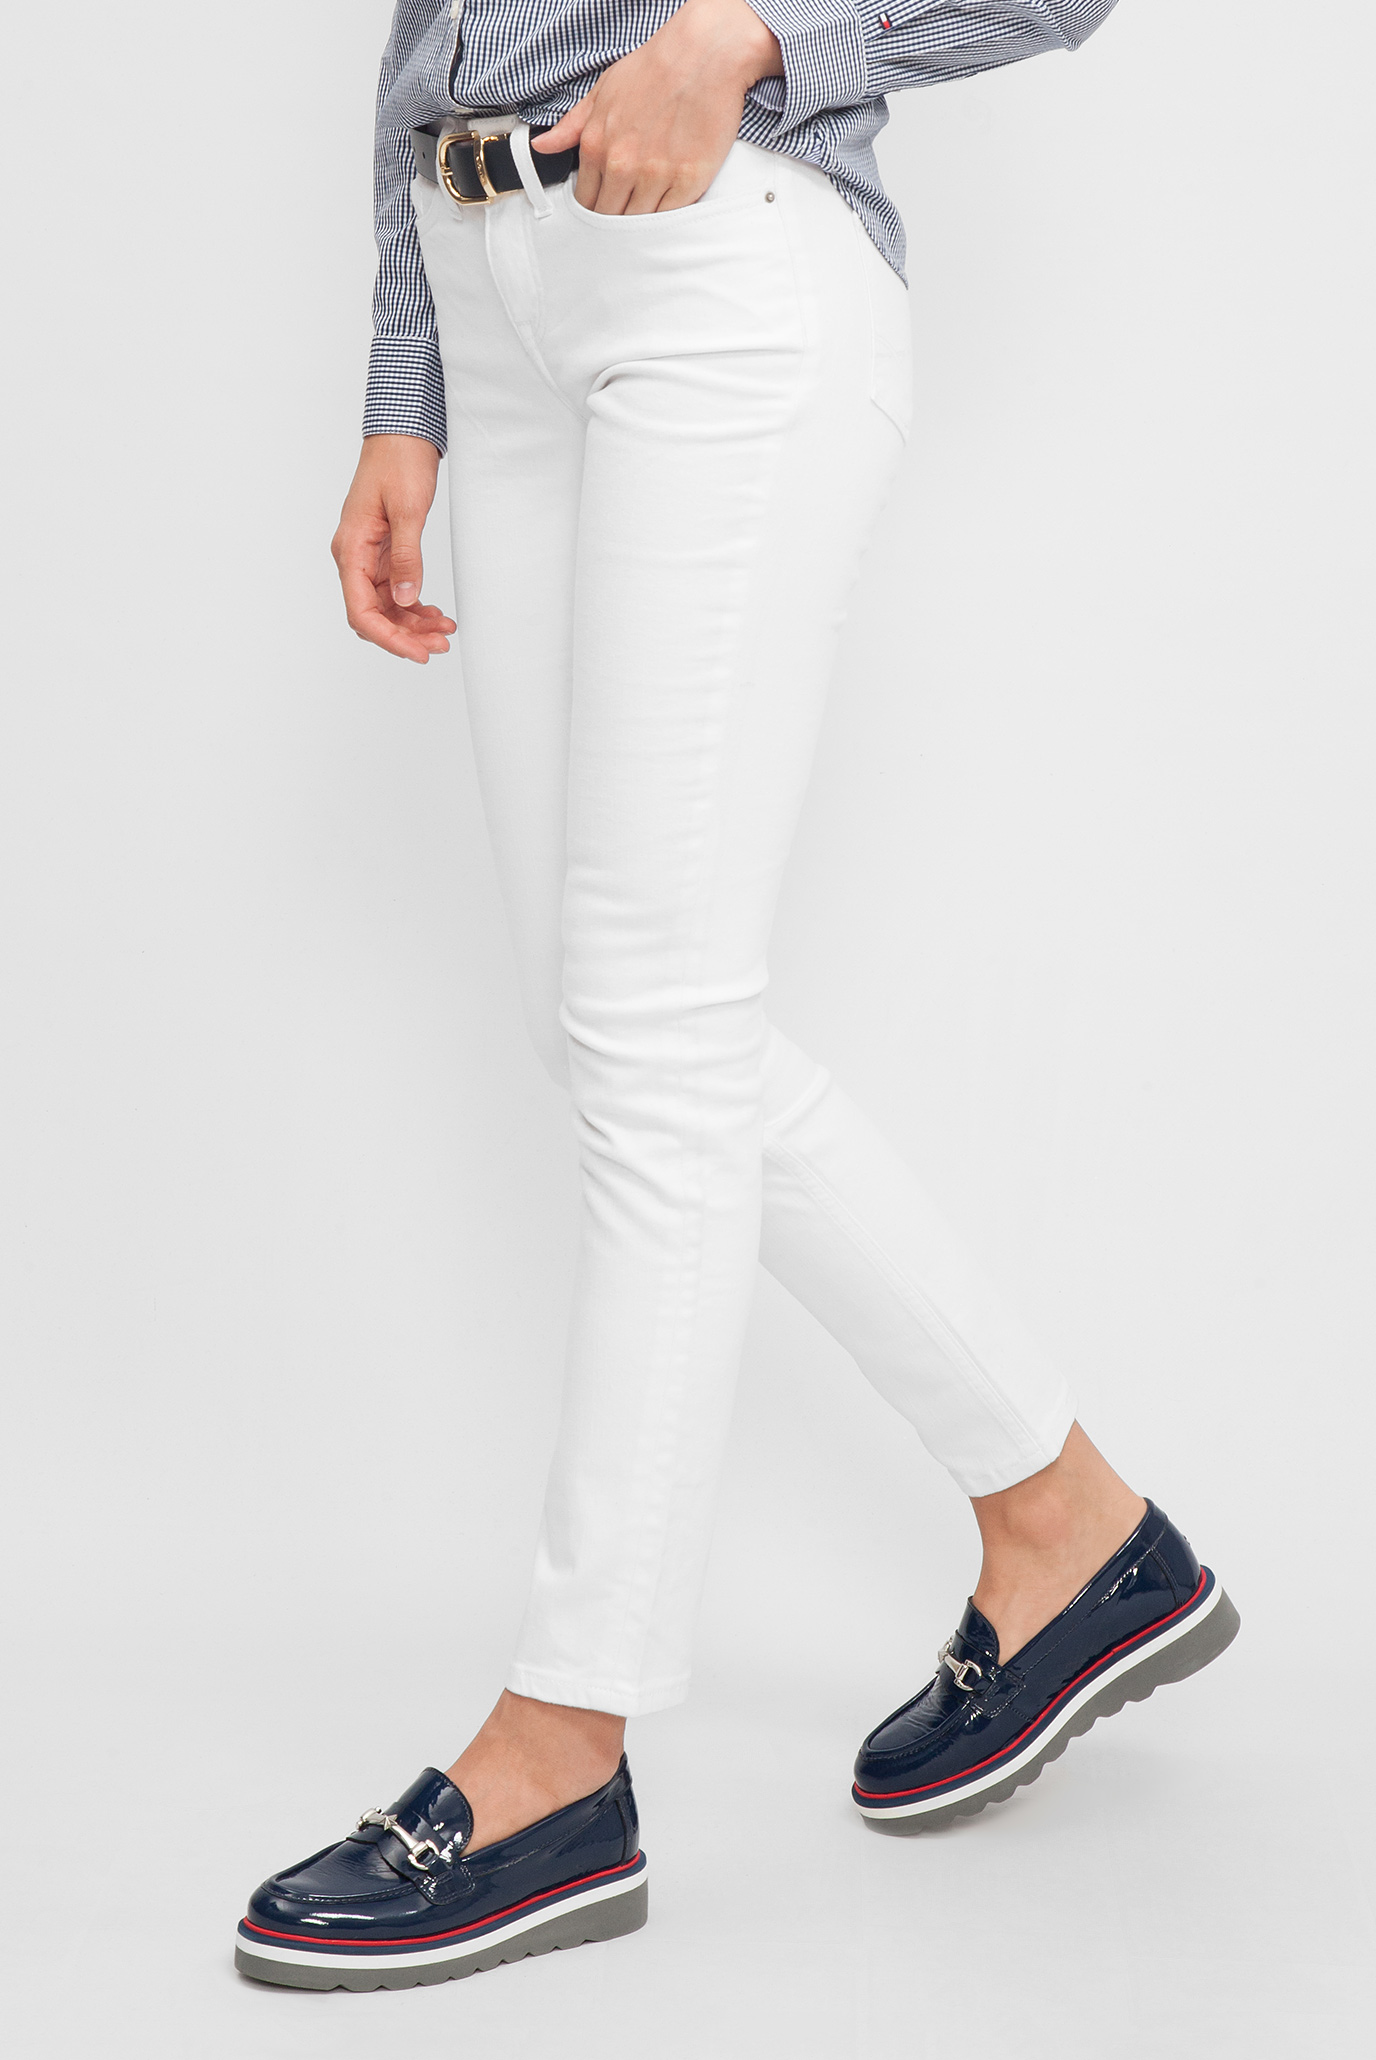 cba7a1a94d0 Купить Женские белые джинсы Tommy Hilfiger Tommy Hilfiger WW0WW11885 –  Киев